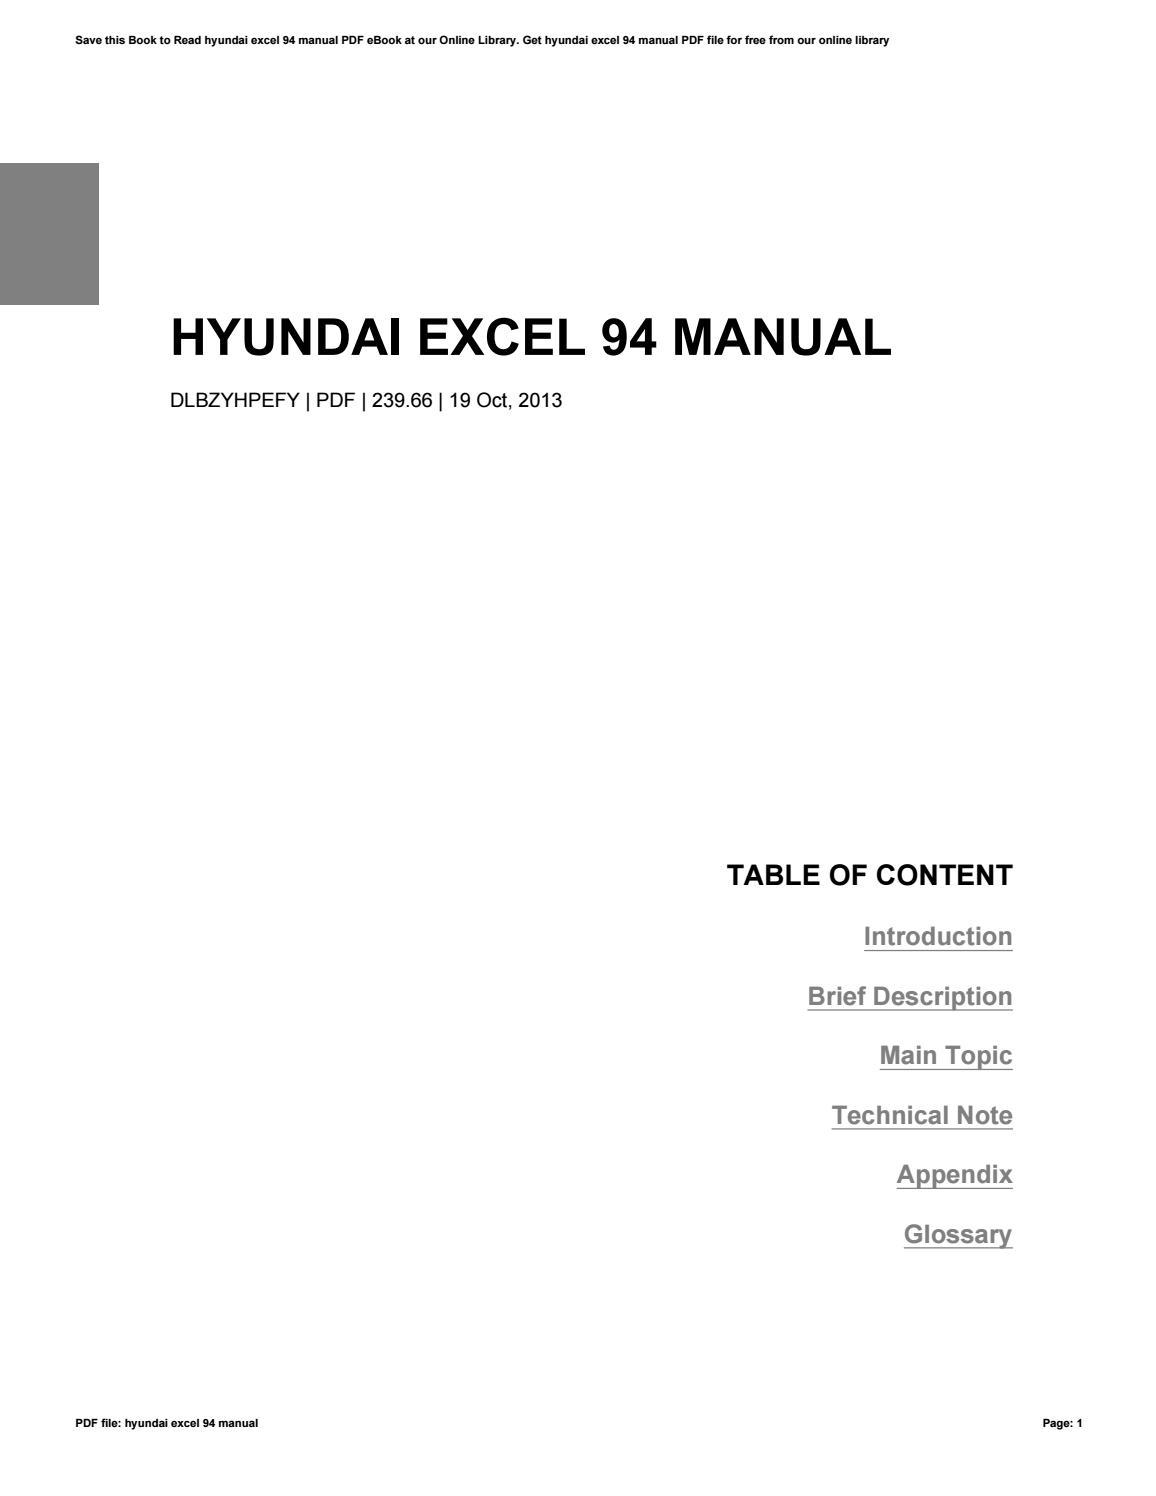 Manual pdf excel 2013 download microsoft excel 2013 advanced student manual pdf array hyundai excel 94 manual by blanca issuu rh issuu fandeluxe Choice Image